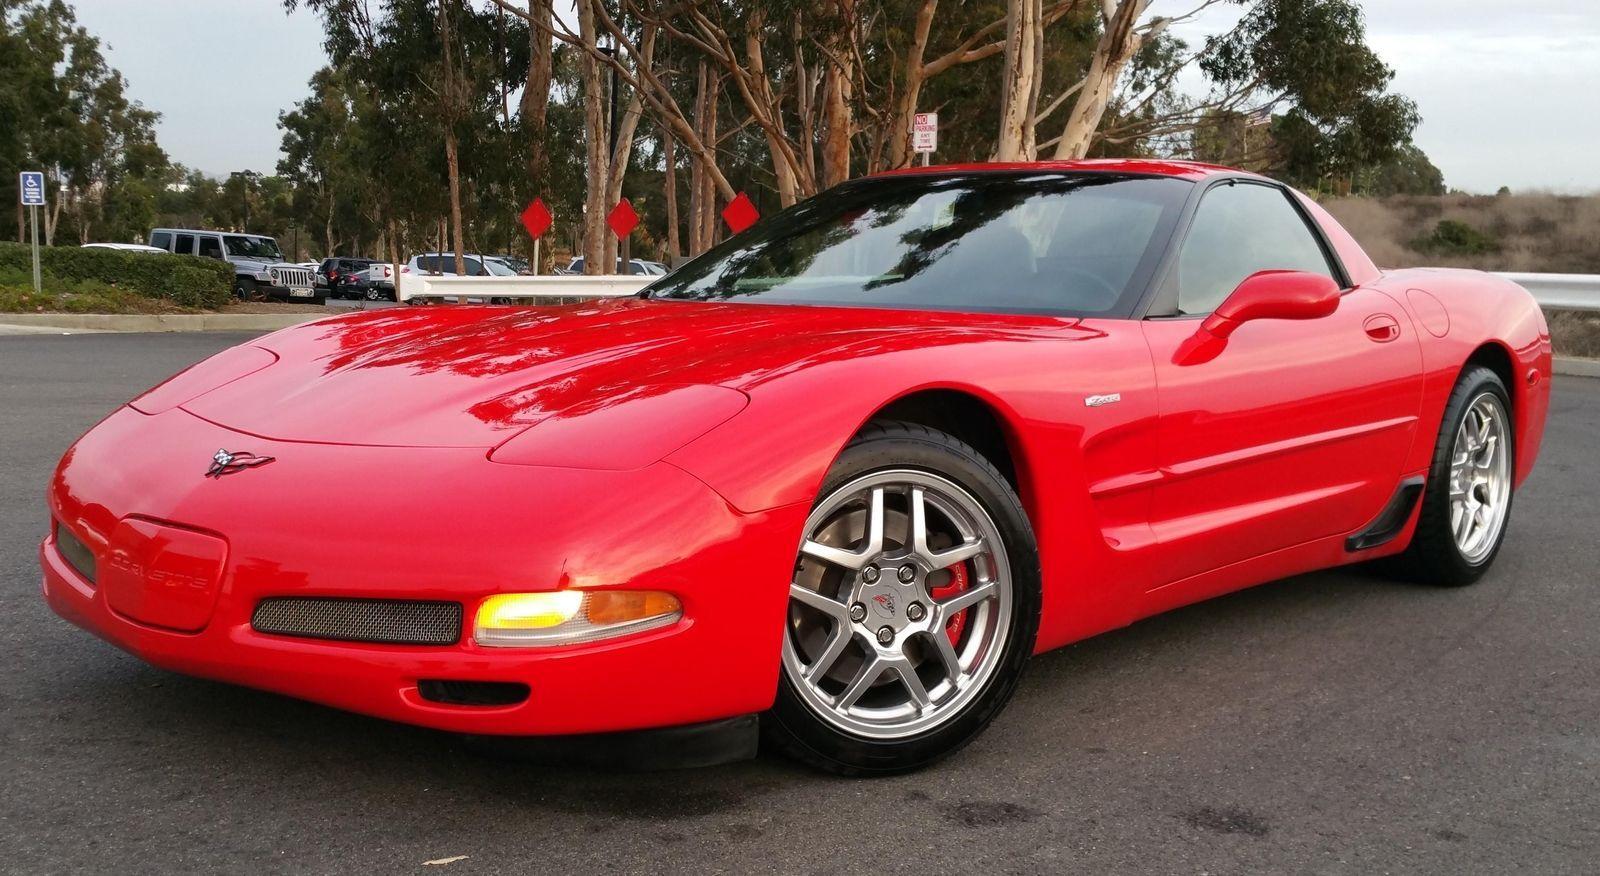 Nice Great 2001 Chevrolet Corvette Z06 2001 Chevrolet Corvette Z06 79 797 Miles Torch Red 2dr Car 8 Cylinder Engin Chevrolet Corvette Z06 Corvette Z06 Corvette